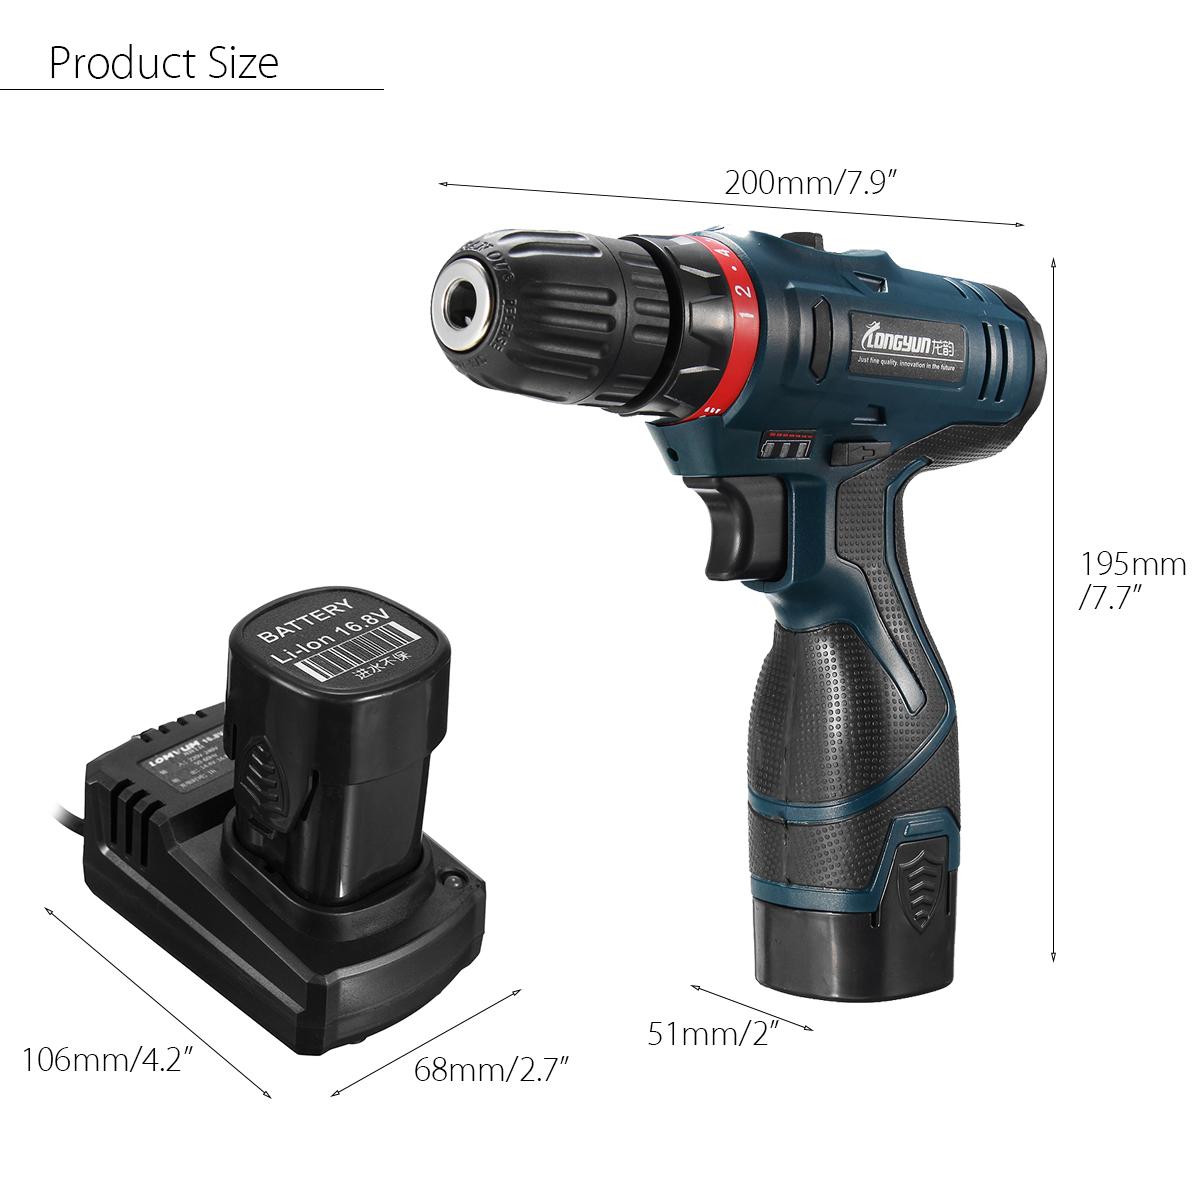 Lomvum 16.8V Electric Cordless Hammer Drill Driver Waterproof Duplex Bearing Auto Lock